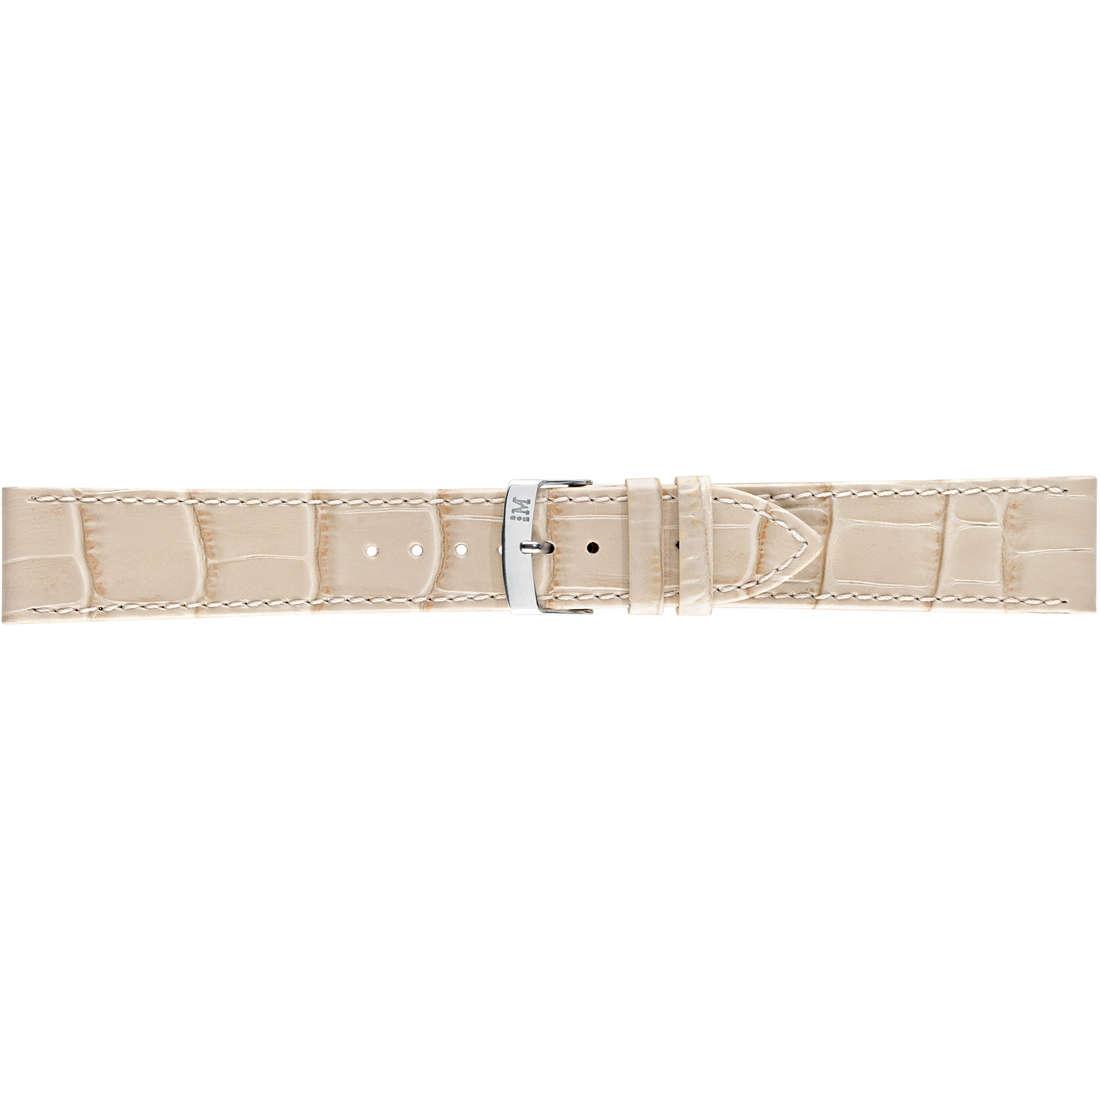 montre bande de montres homme Morellato Performance A01X2524656326CR18